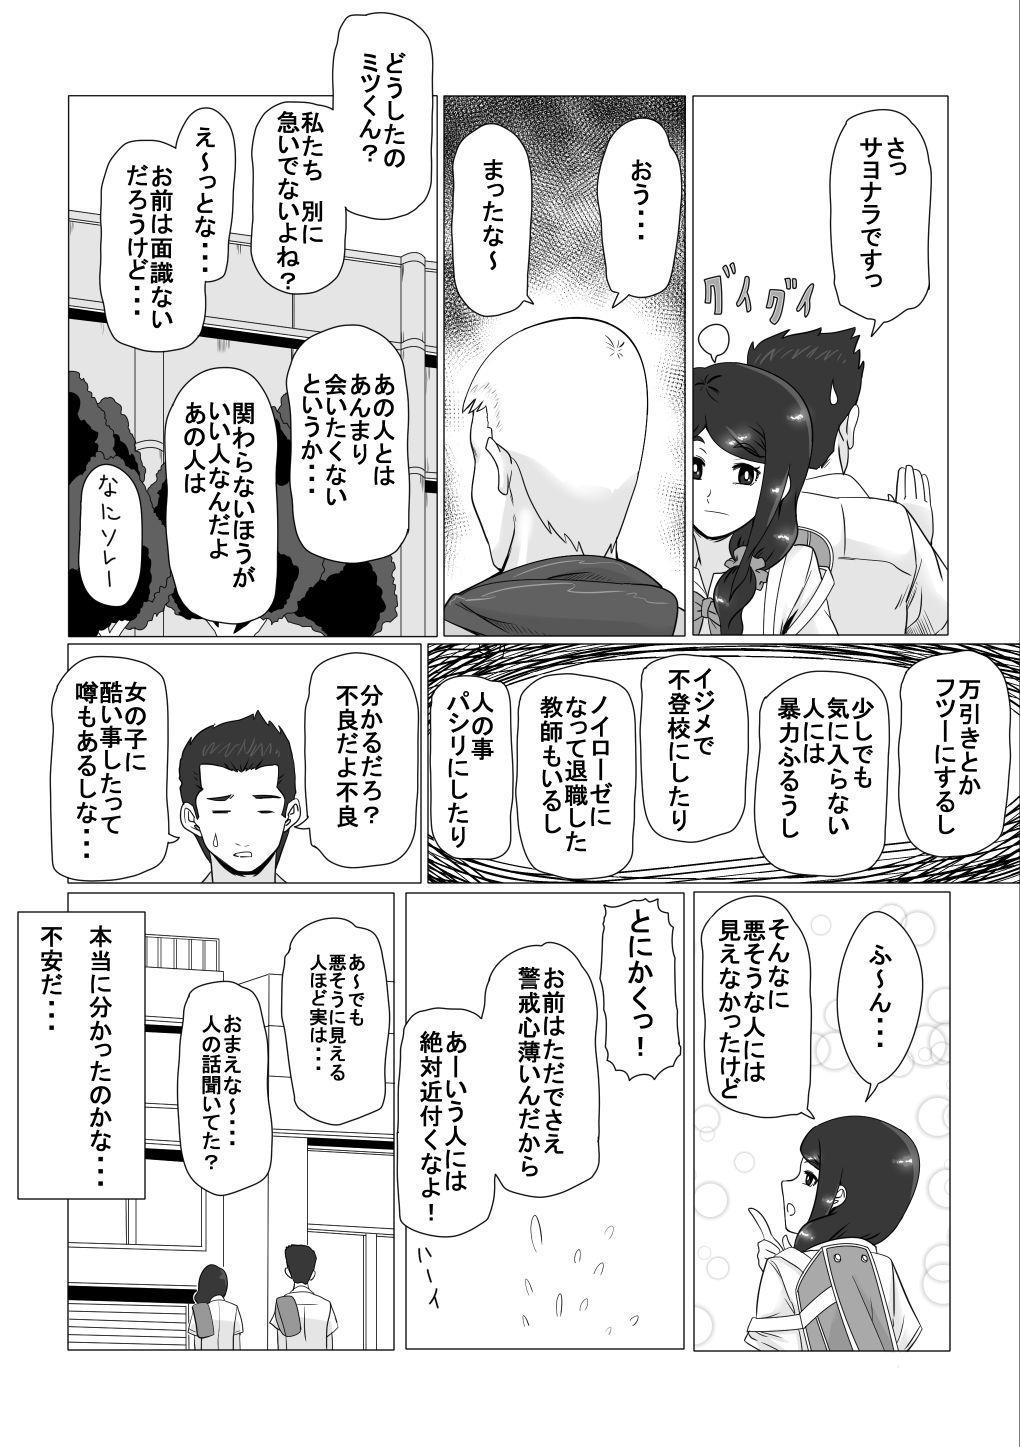 Osananajimi no Natsuyasumi 7